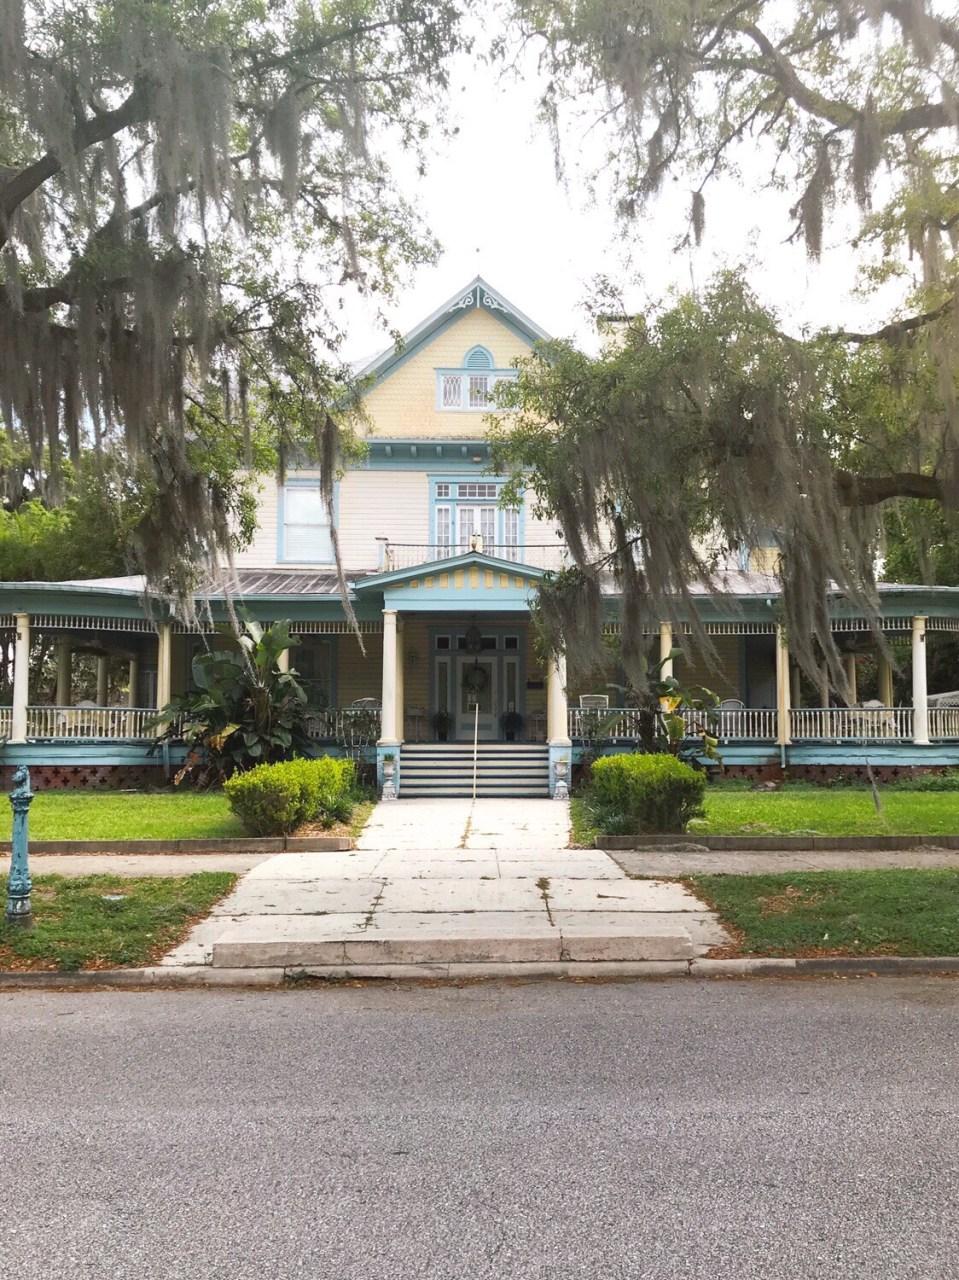 My Girl House - Former Stanford Inn in Bartow, FL